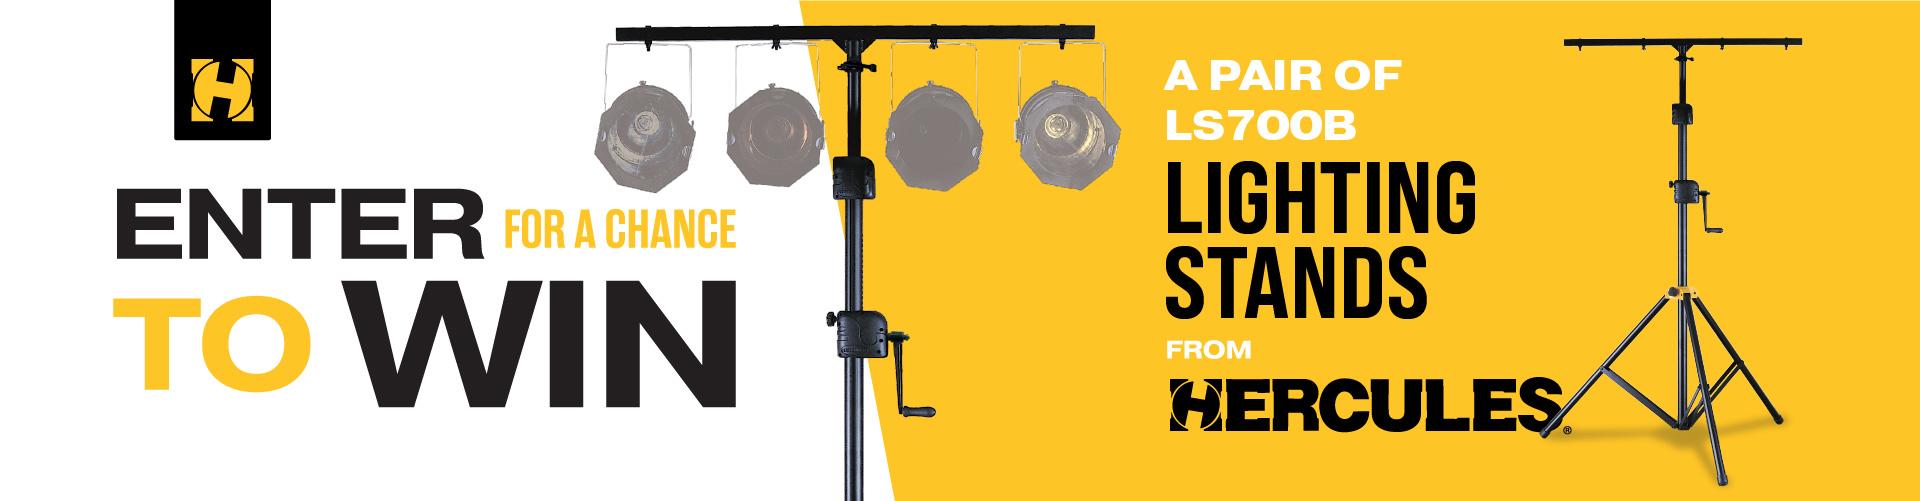 Lighting Stand Sweepstakes